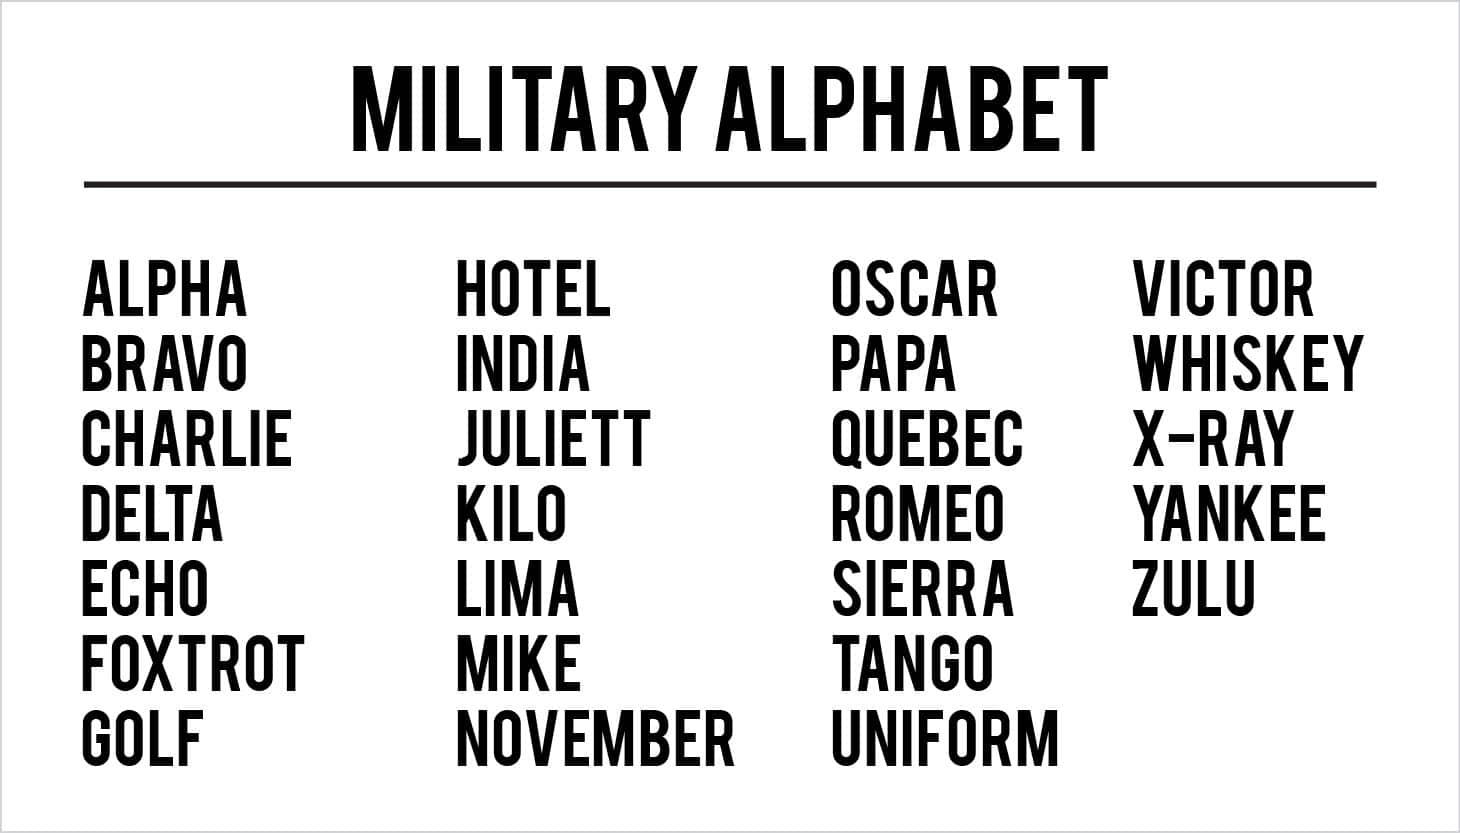 Military Alphabet Chart